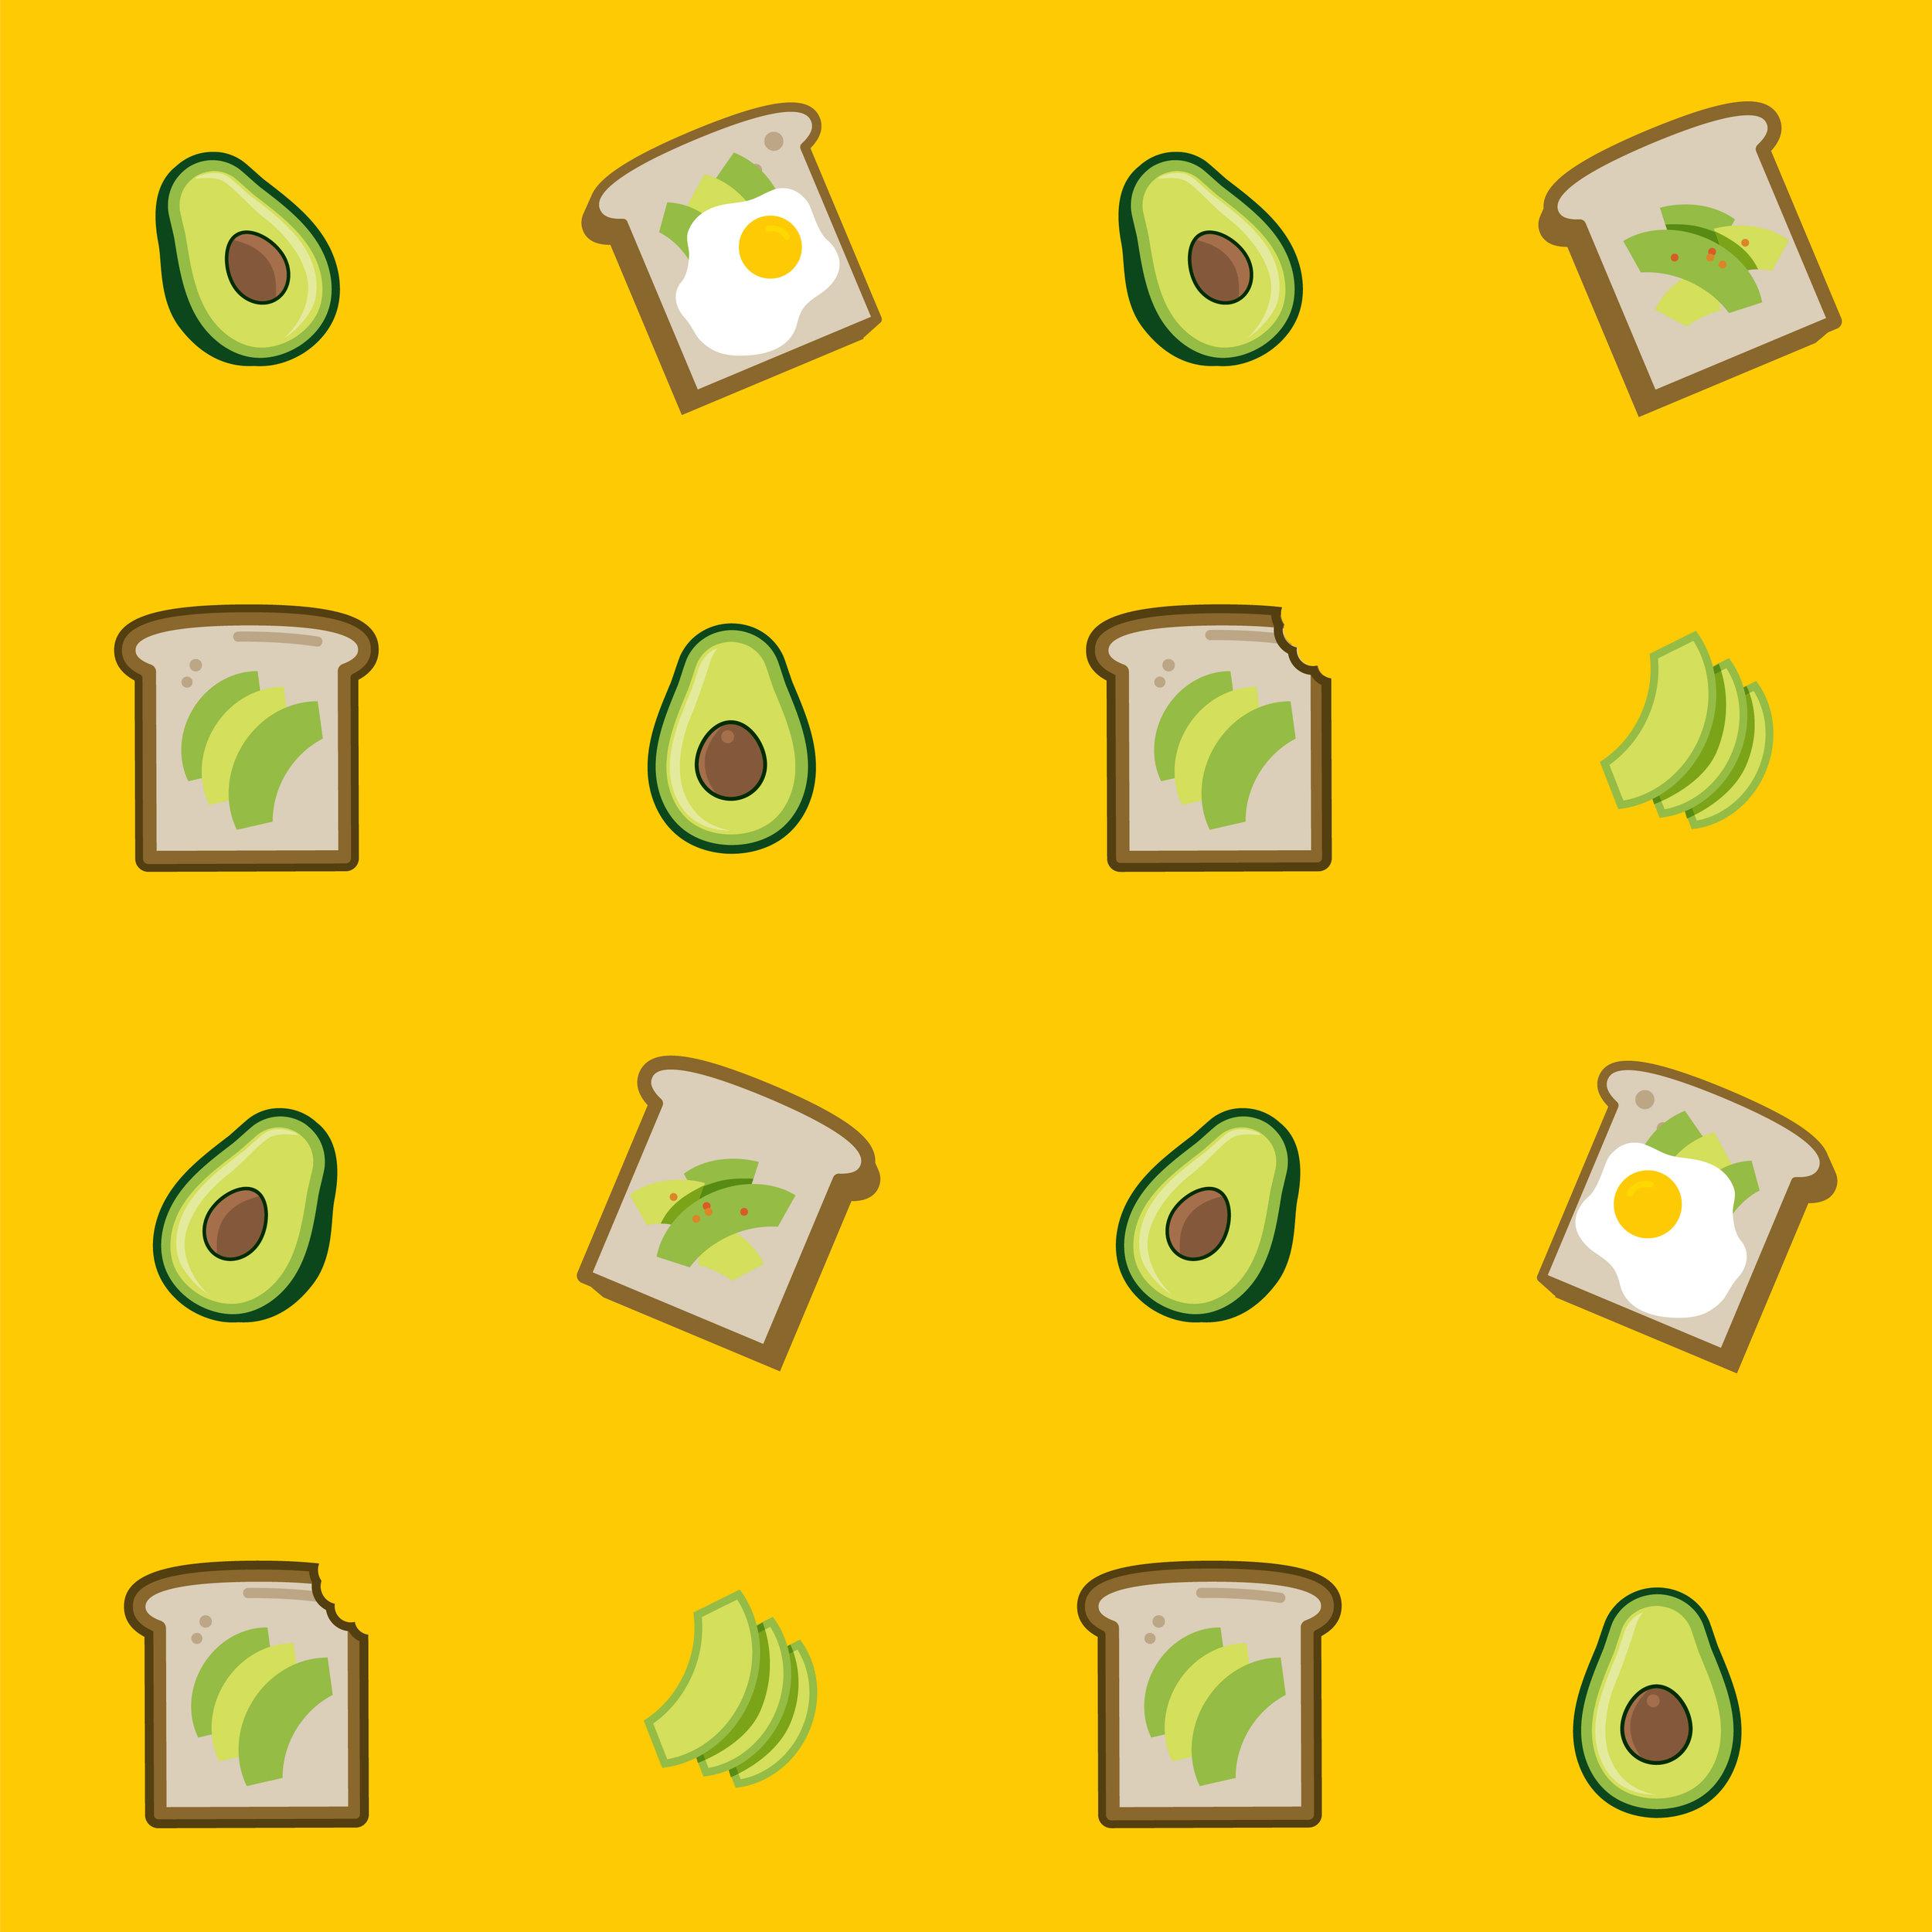 Avocado toast pattern in yellow